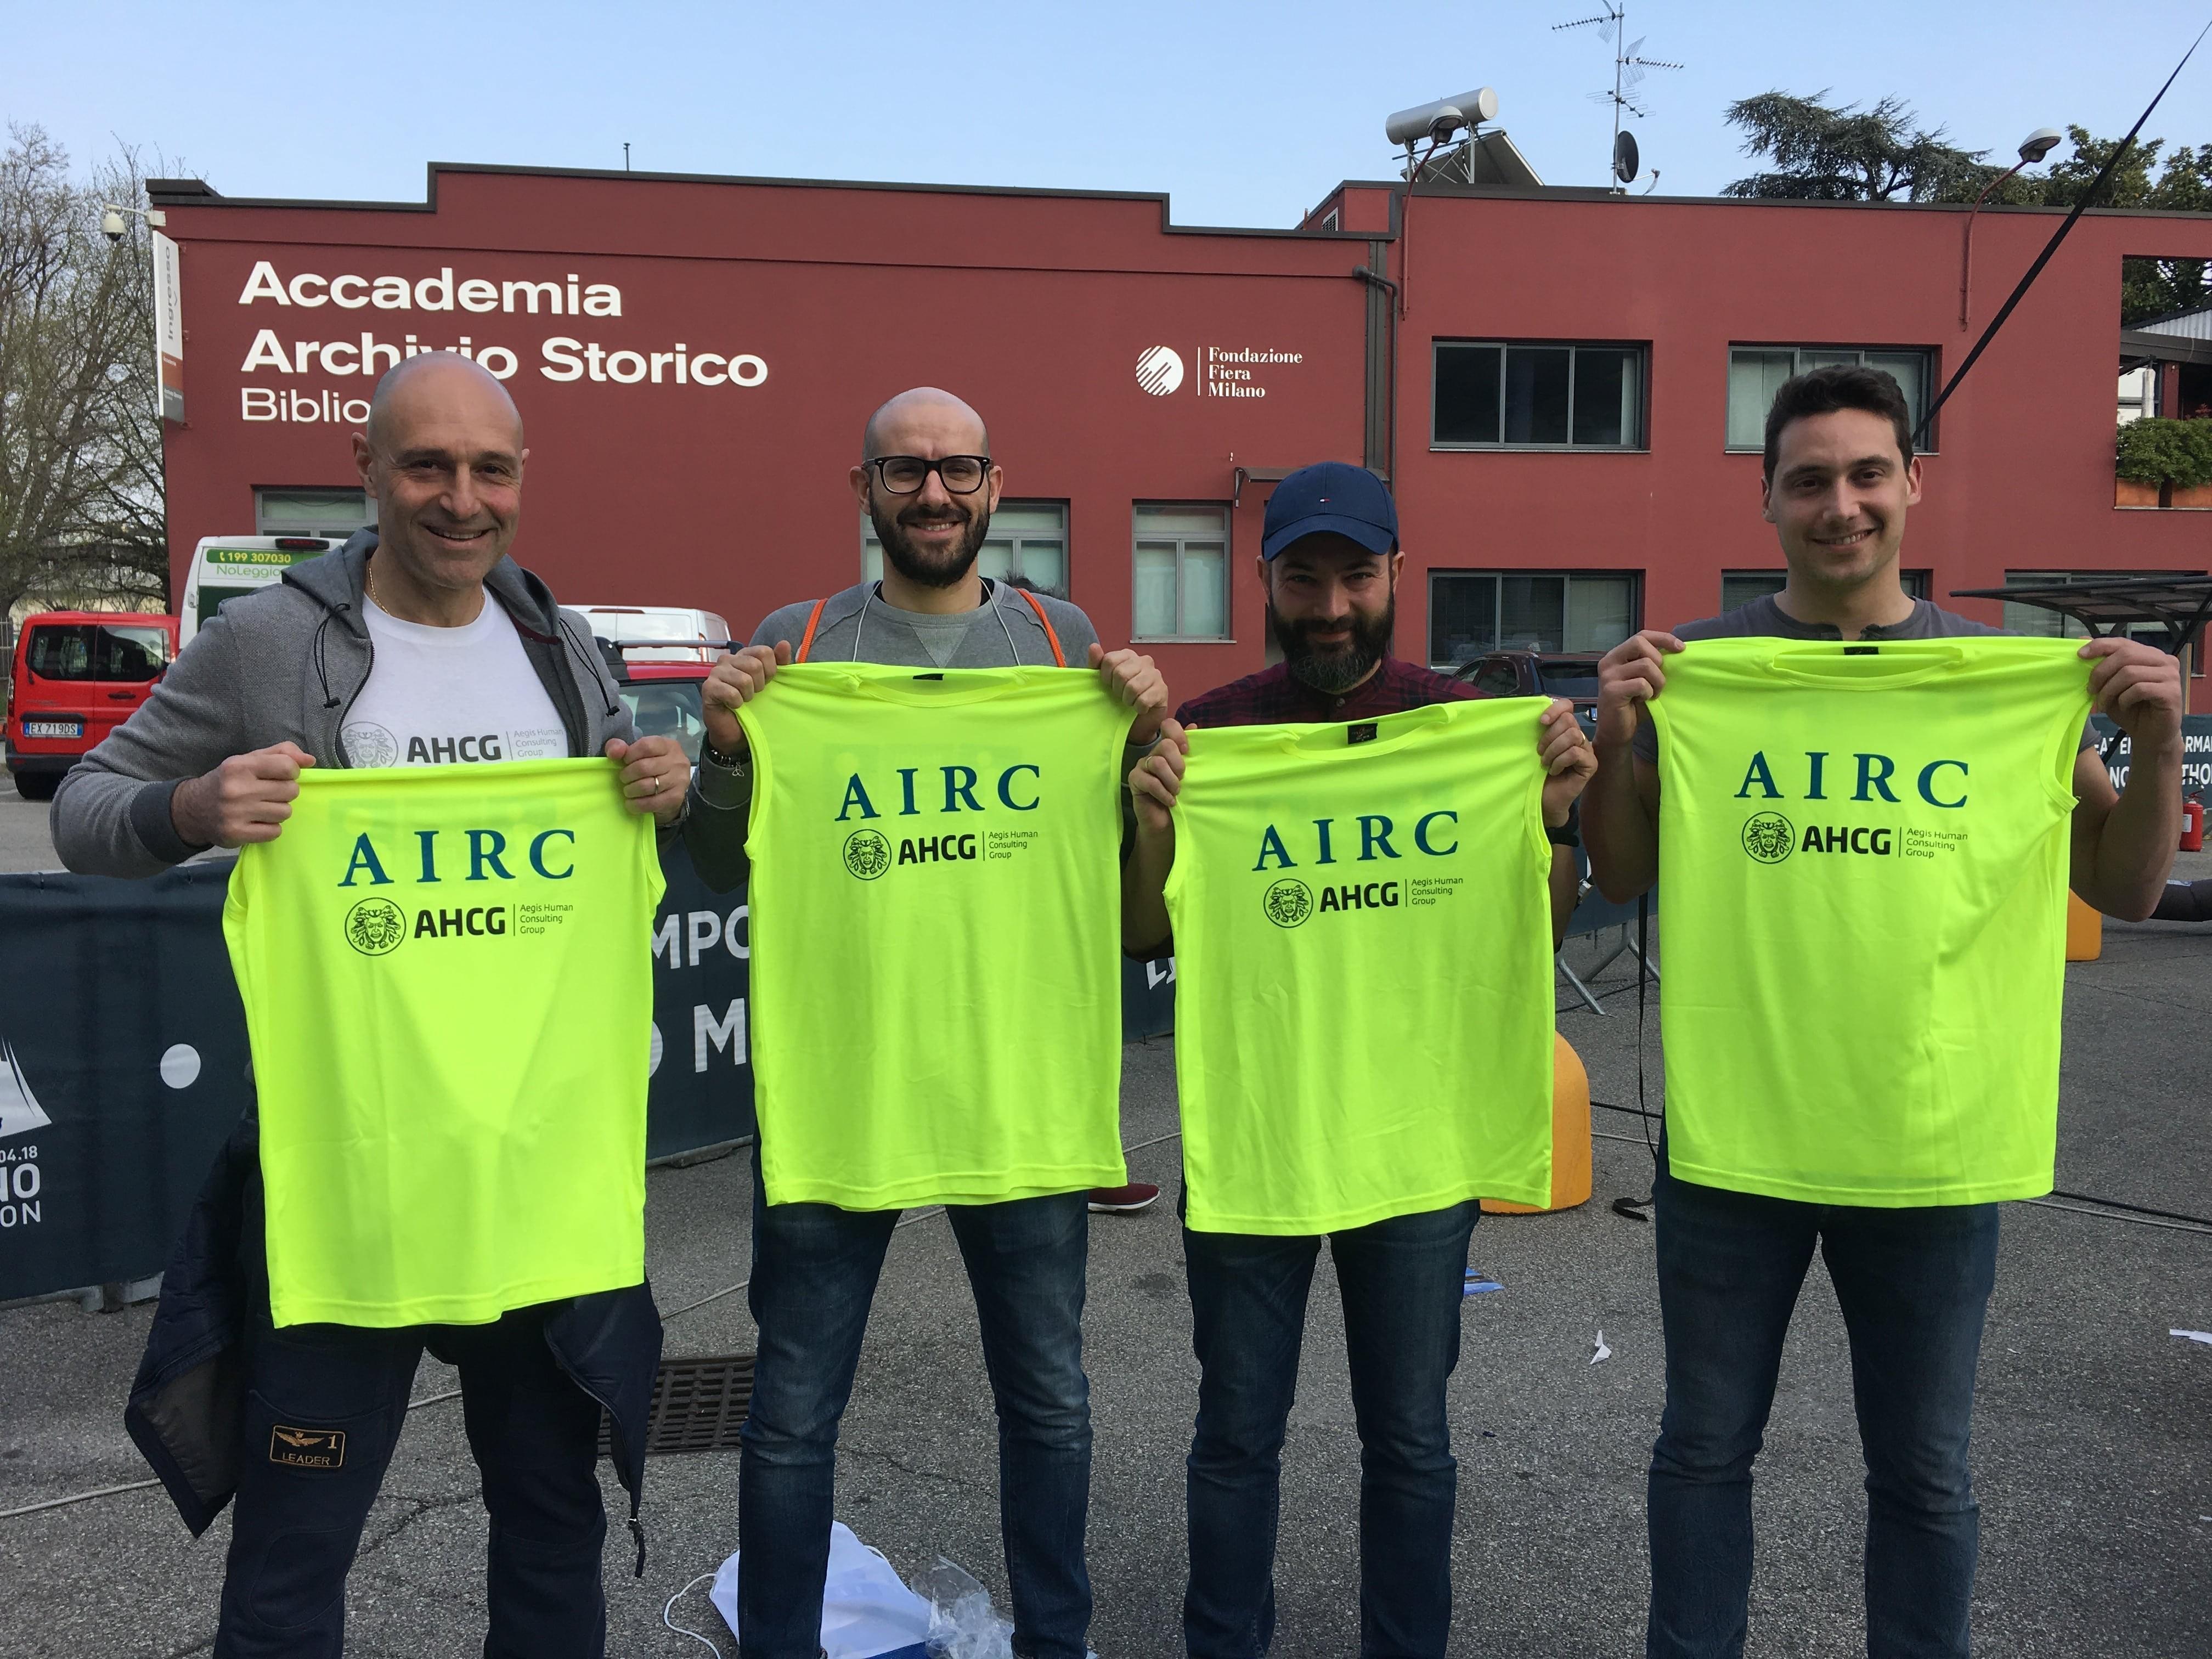 Aegis corre per AIRC-Aegis Human Consulting Group